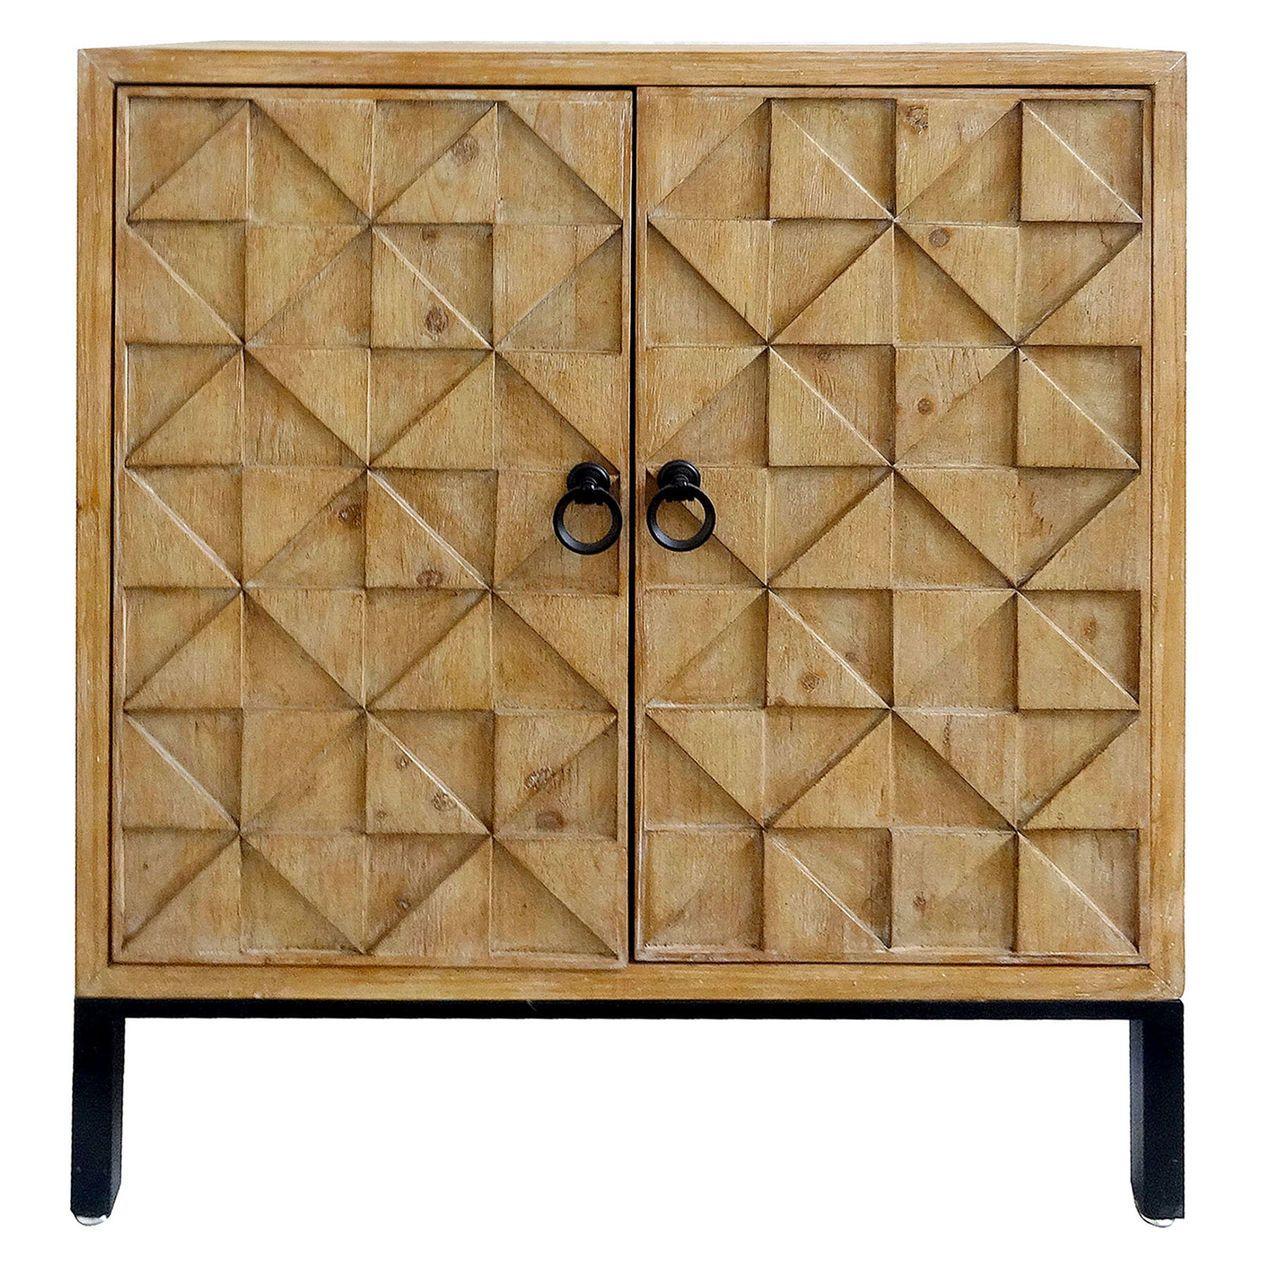 Carmine Textured 2dr Cab At Home Door Texture Wood Doors Wood Cabinets